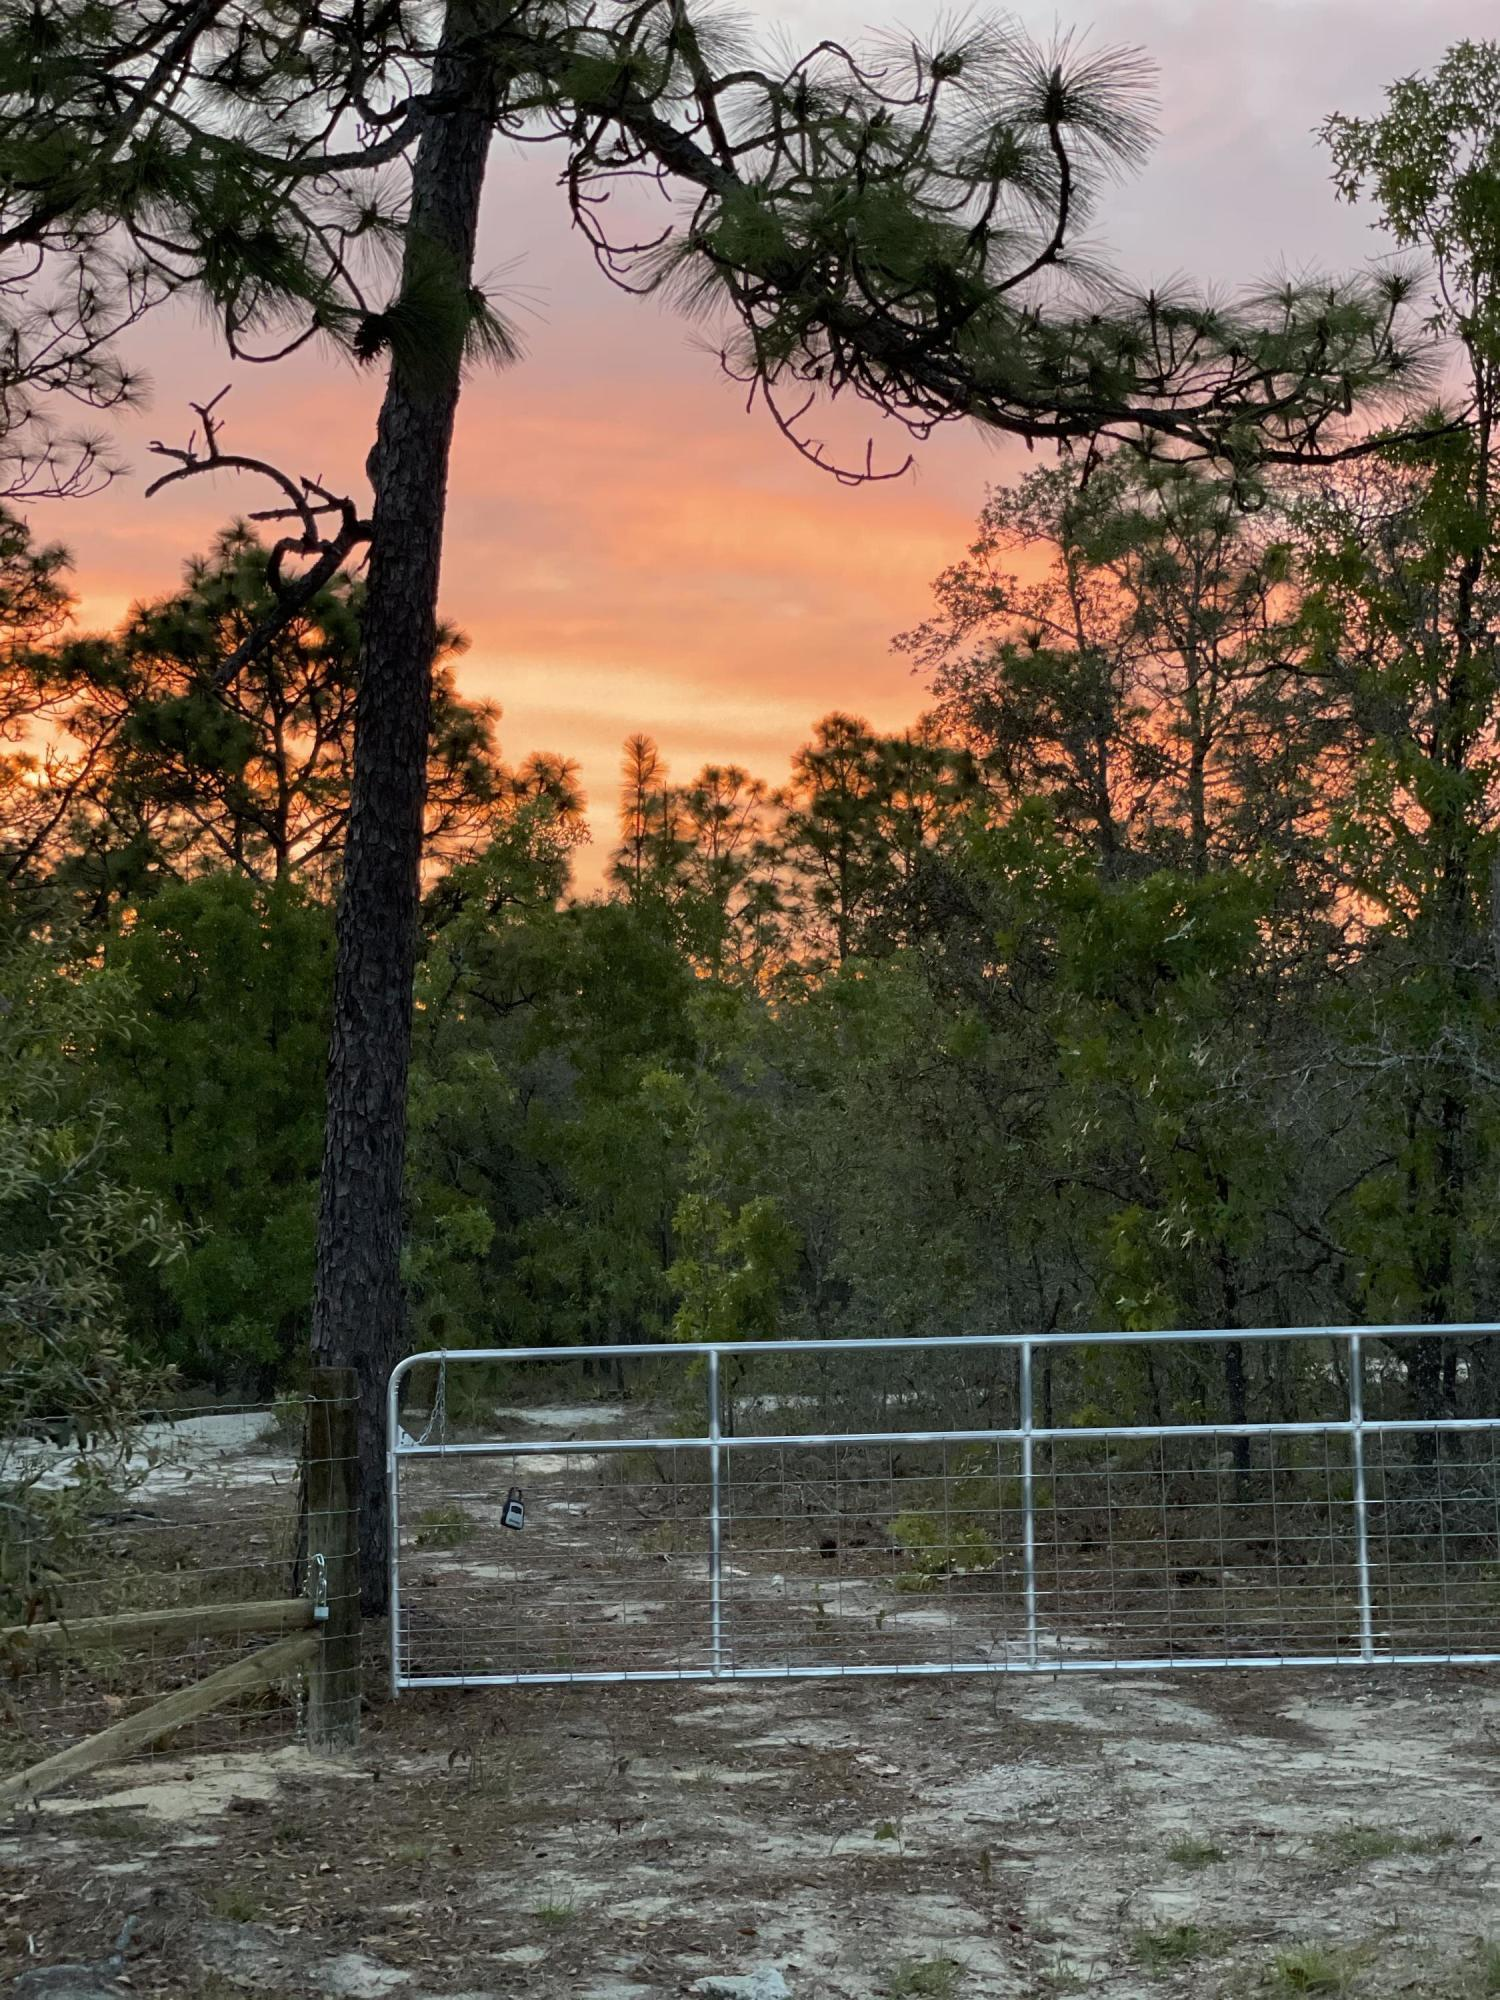 Details for 00 Hawks Nest Trail, Weeki Wachee, FL 34614